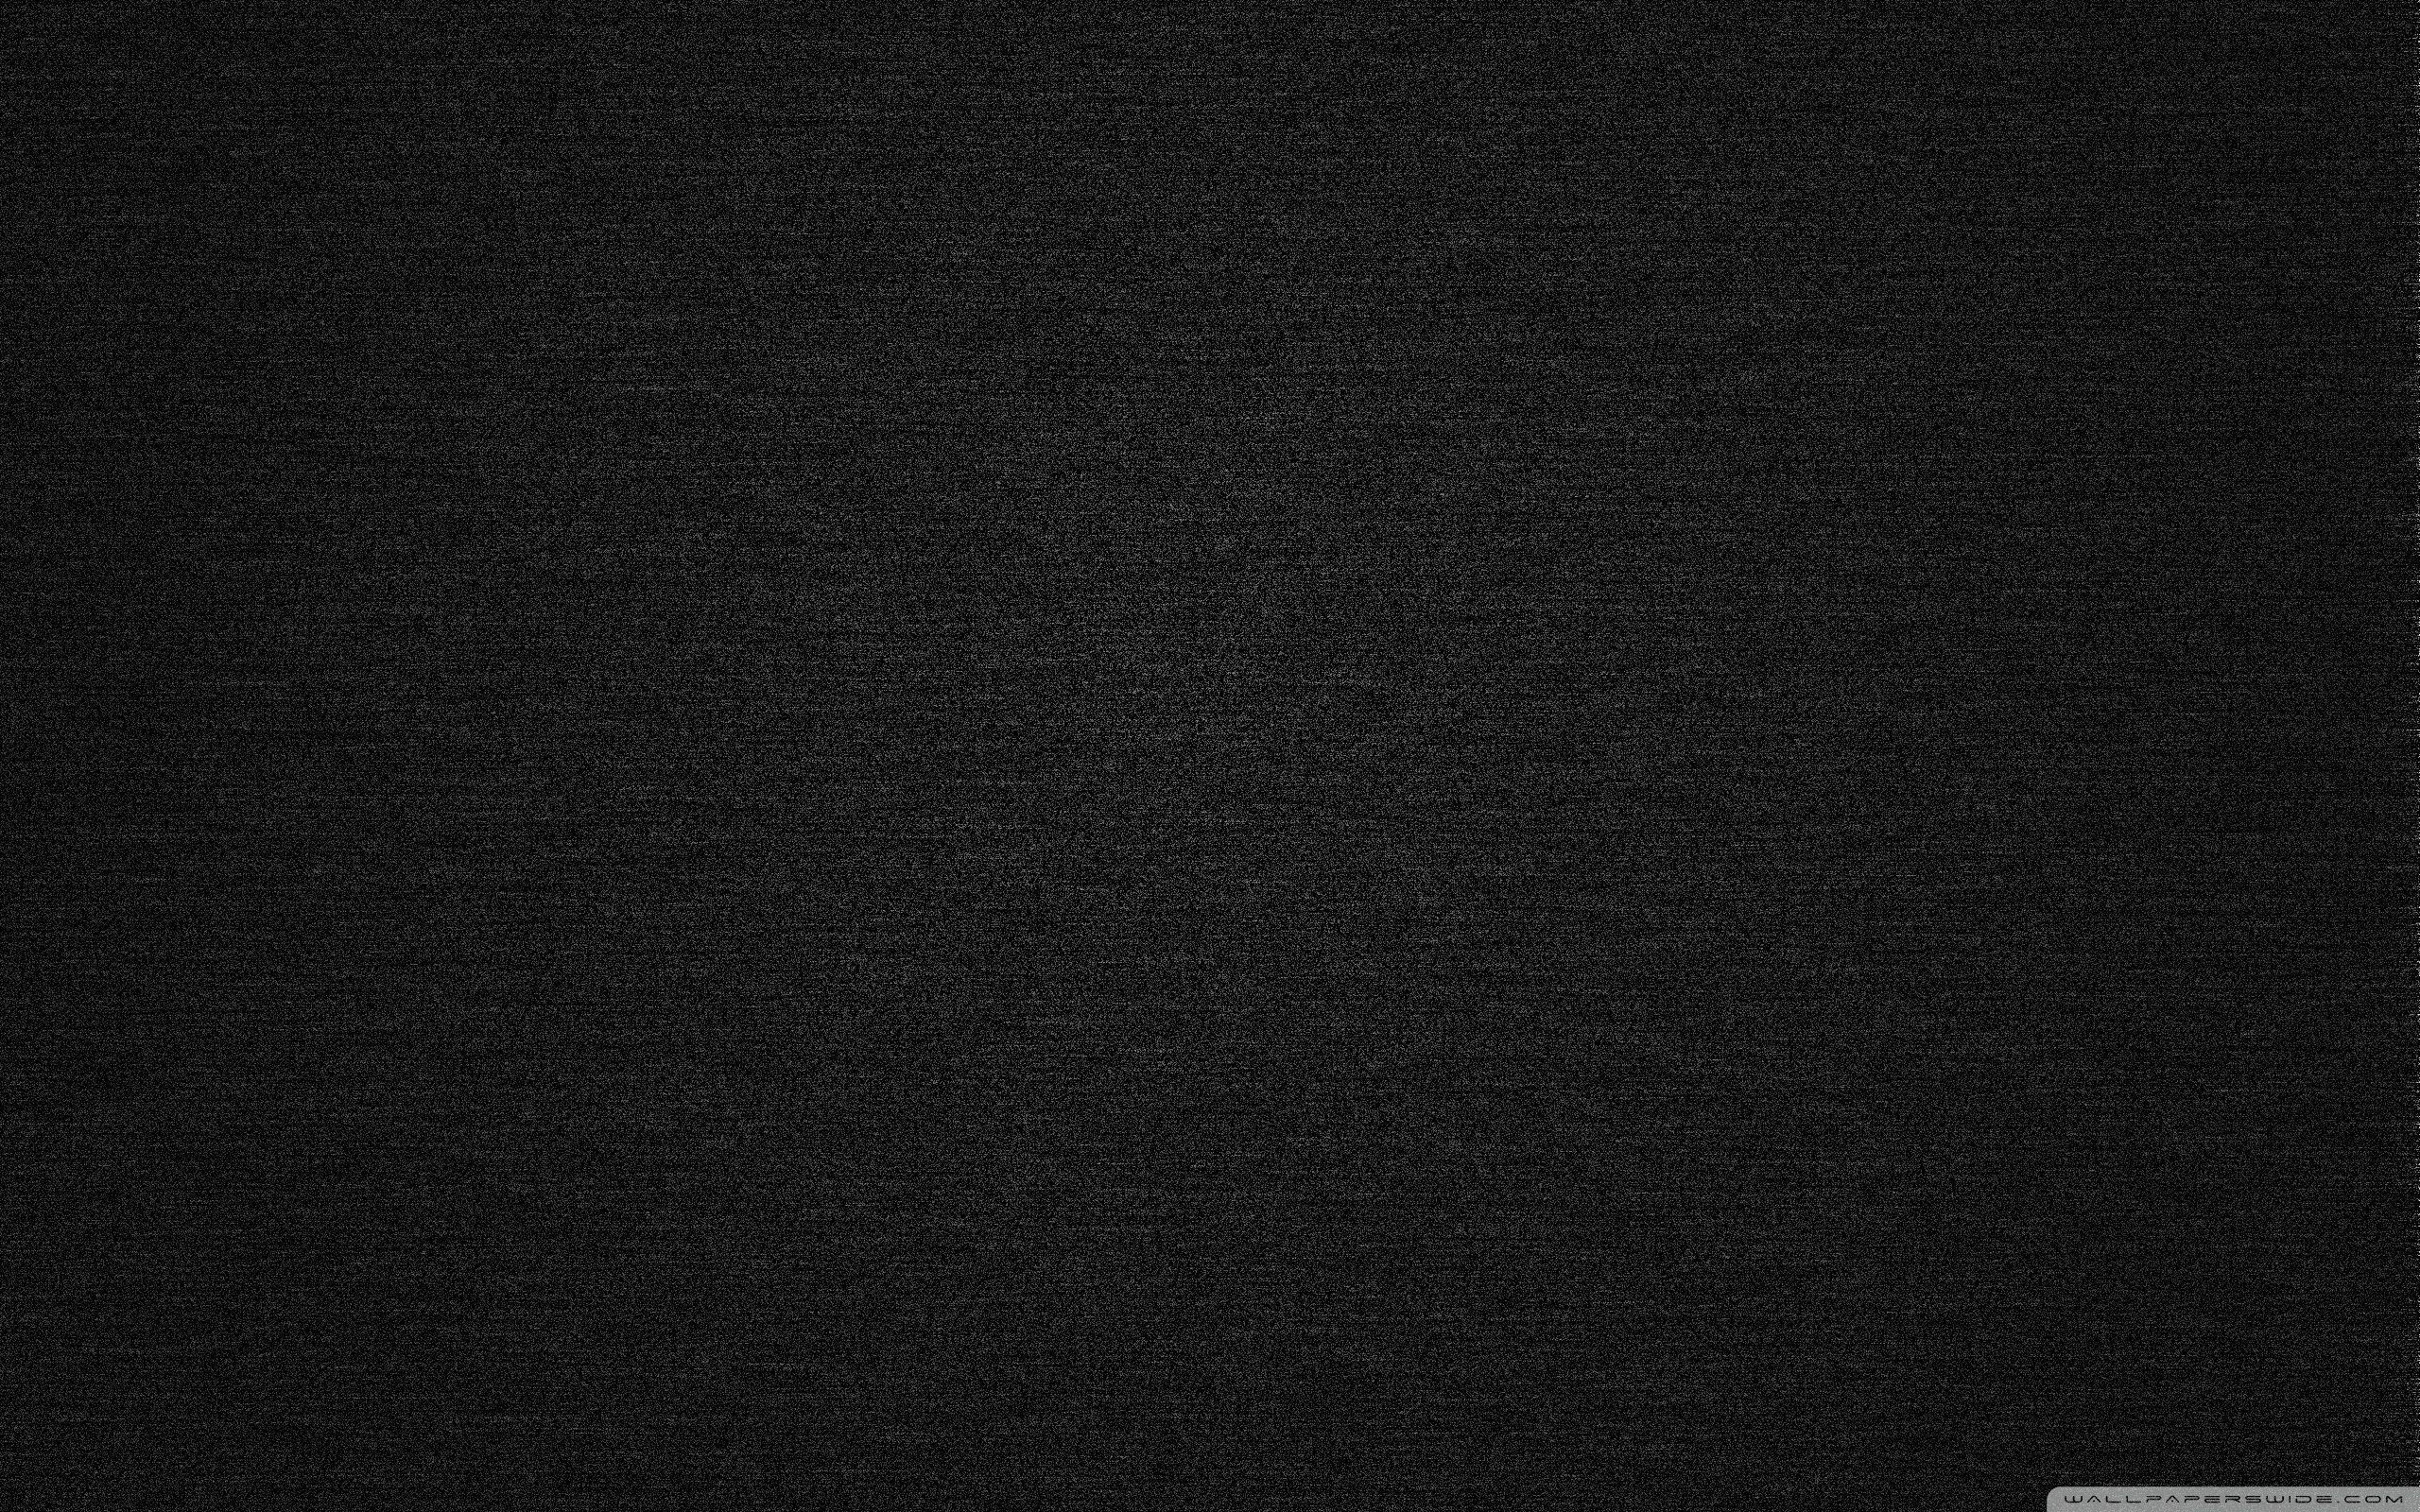 black background wallpaper 2560x1600 - photo #8